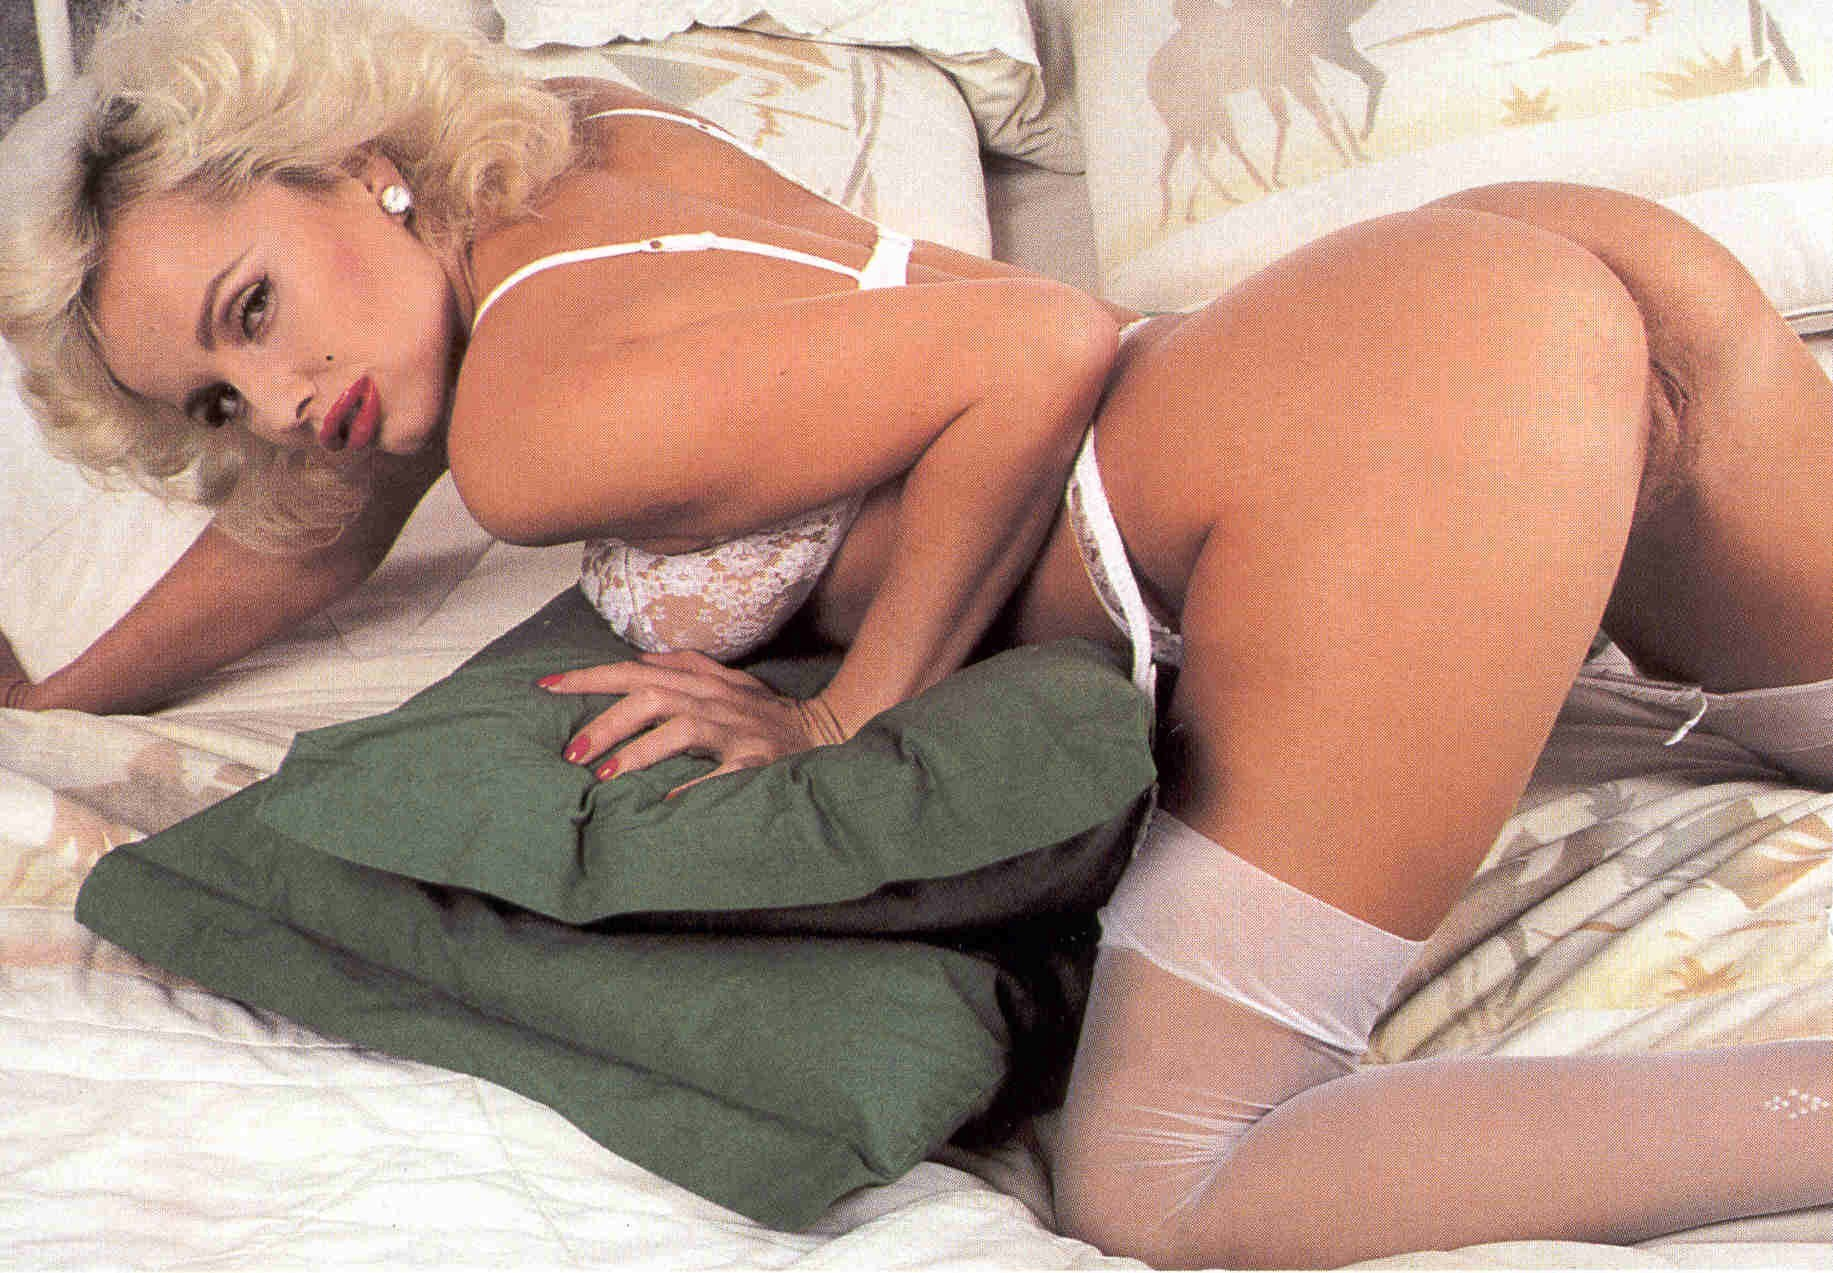 inside-marilyn-porn-movie-strap